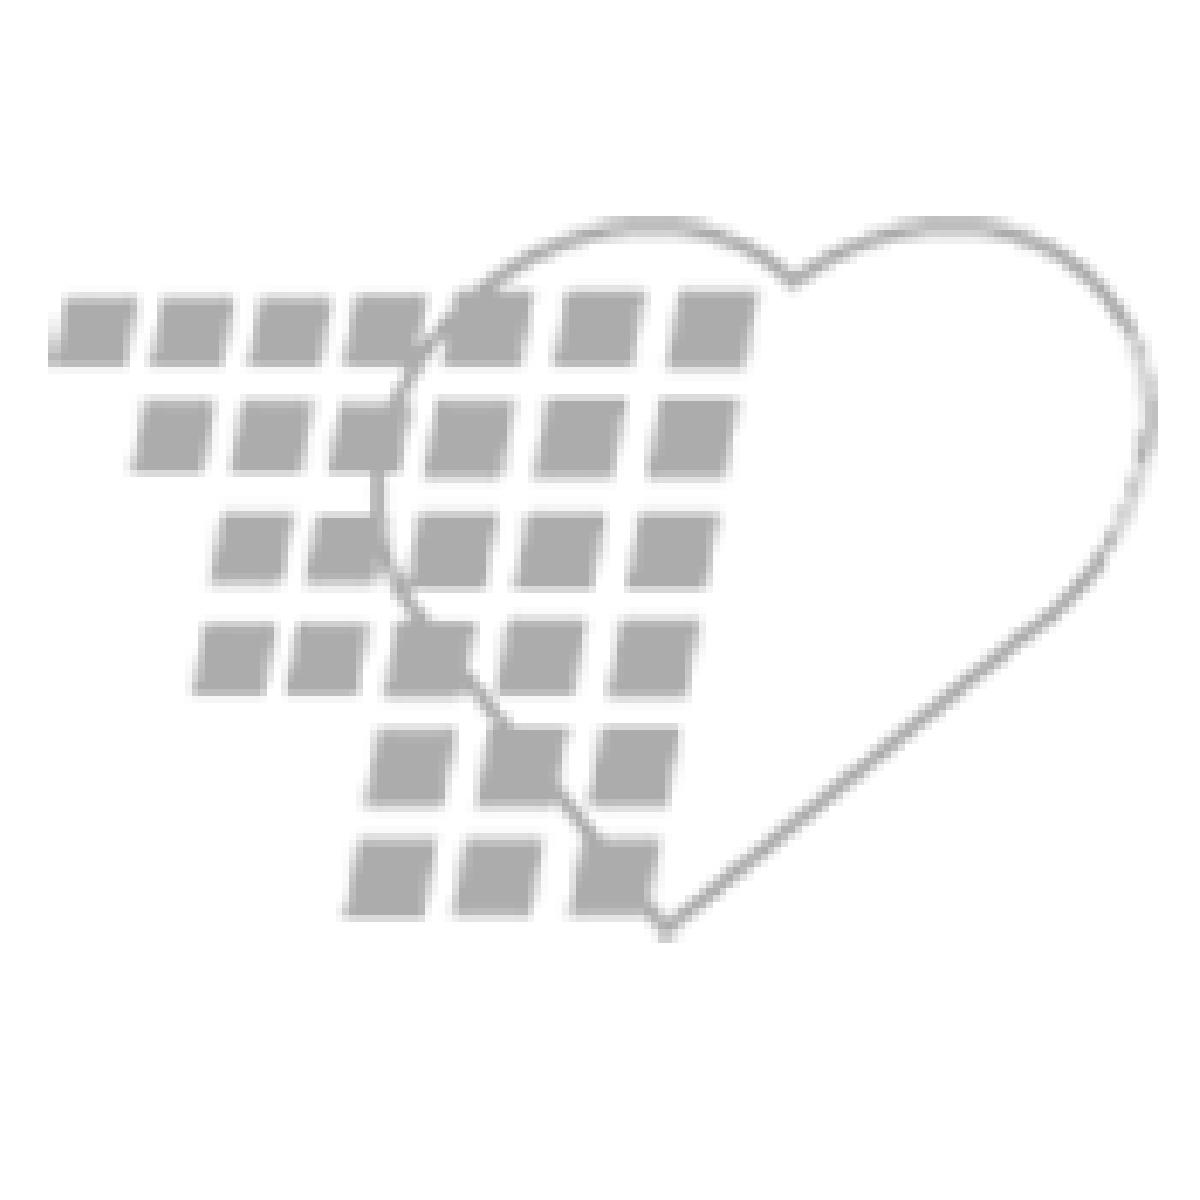 06-93-6000 - Demo Dose® Simulated Blood AB Negative